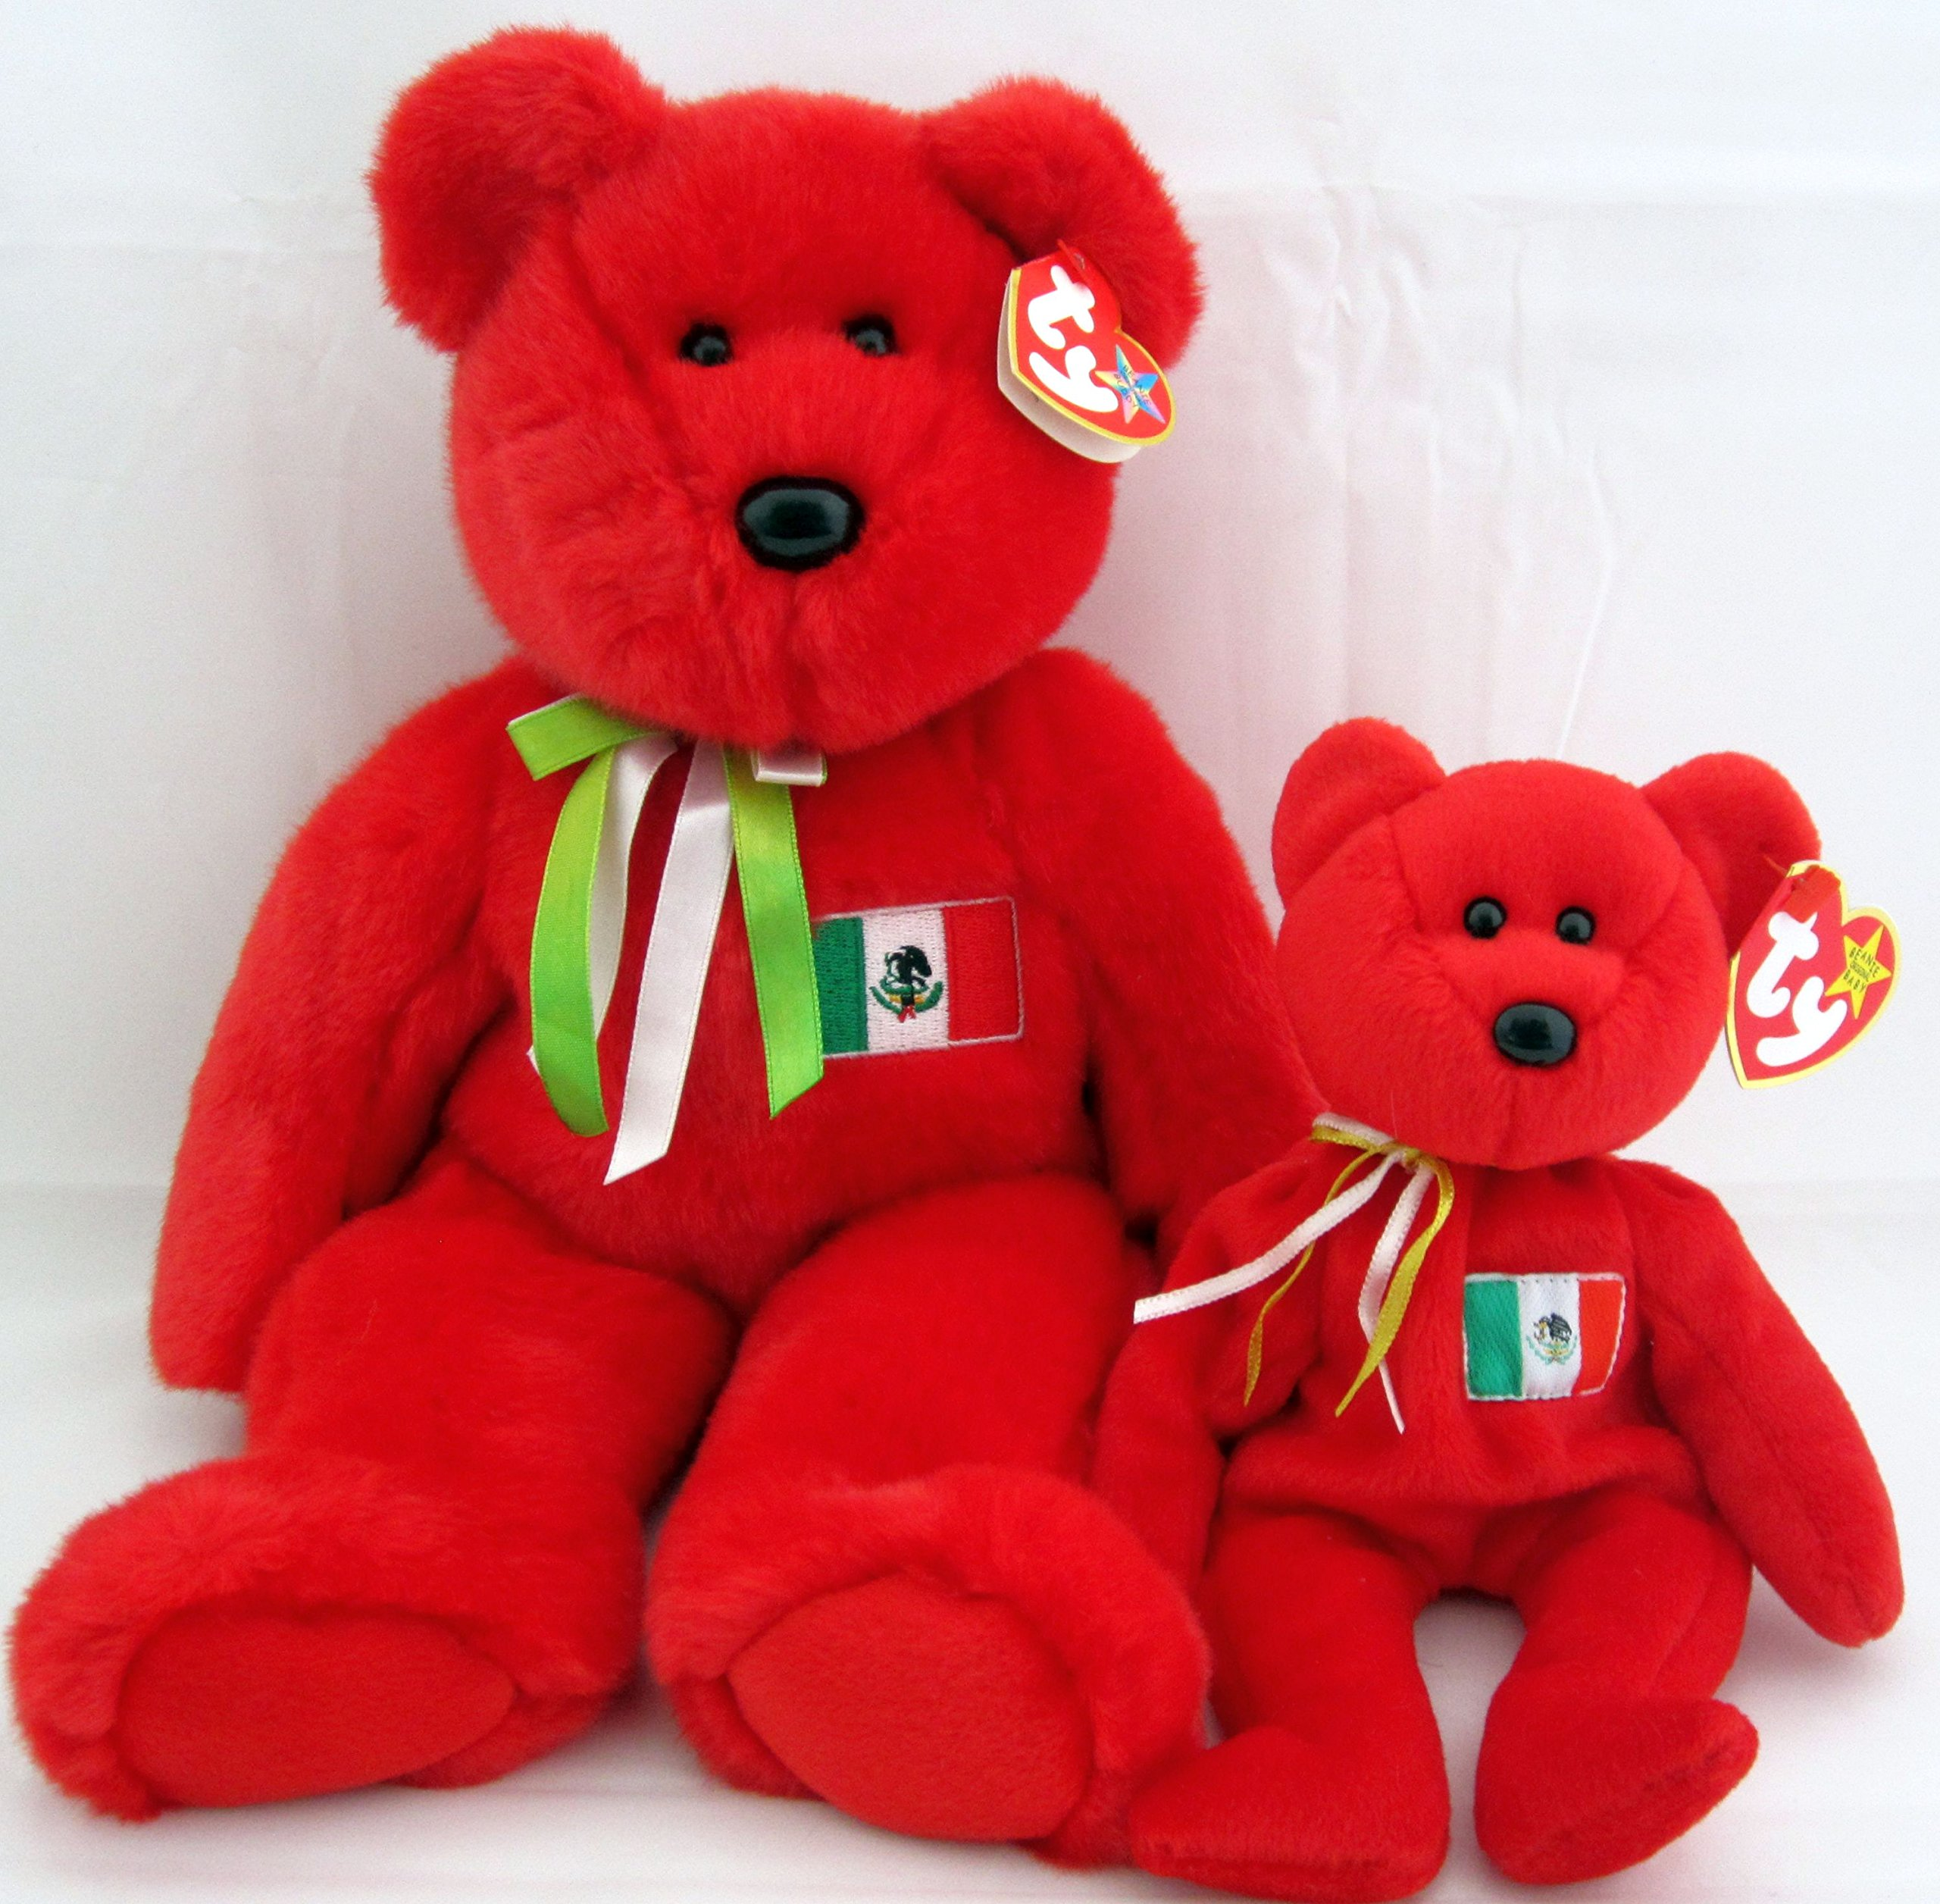 Buy Ty Specks   Ellie the Elephants Beanie Boos Set of 2 Plush Toys ... 65bd19f4adfc